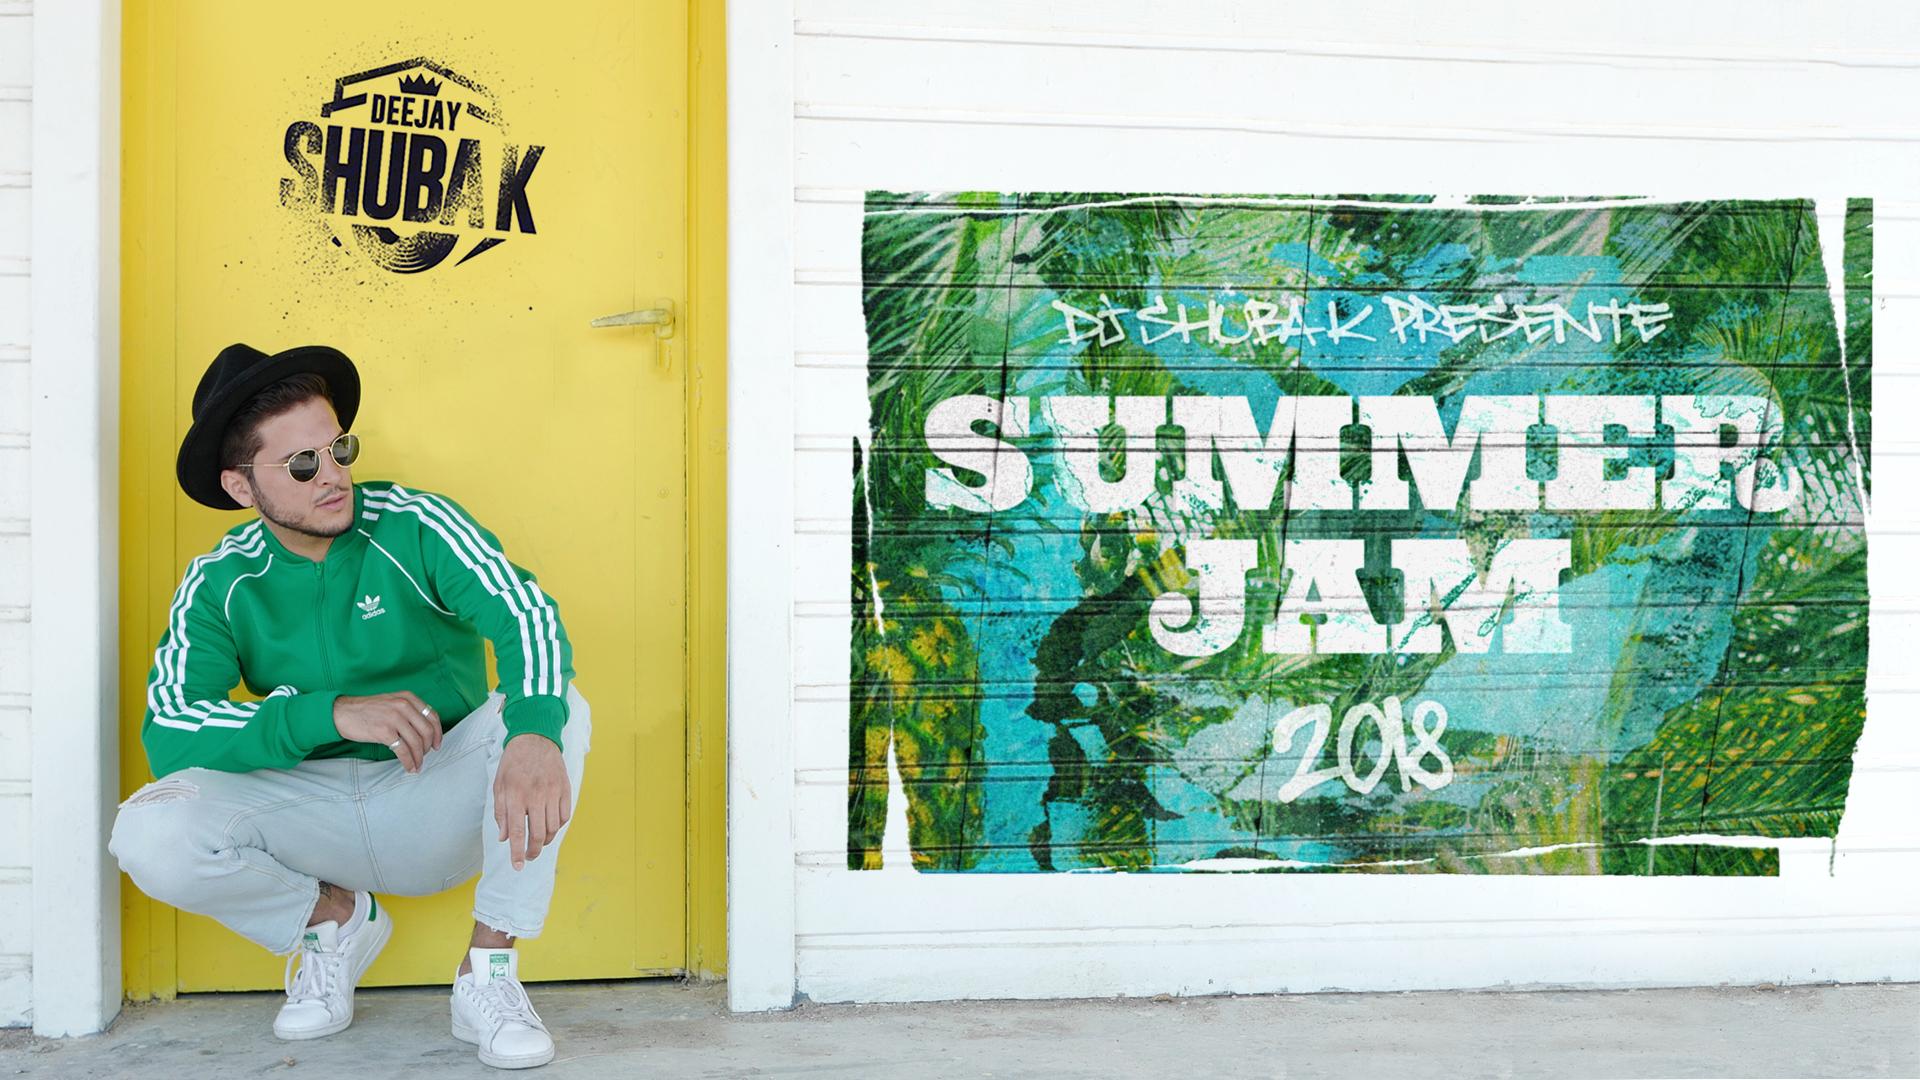 SUMMER_JAM_2018_PODCAST_MIX_DJ_SHUBA_K_REGGAETON_DANCEHALL_AFROBEAT